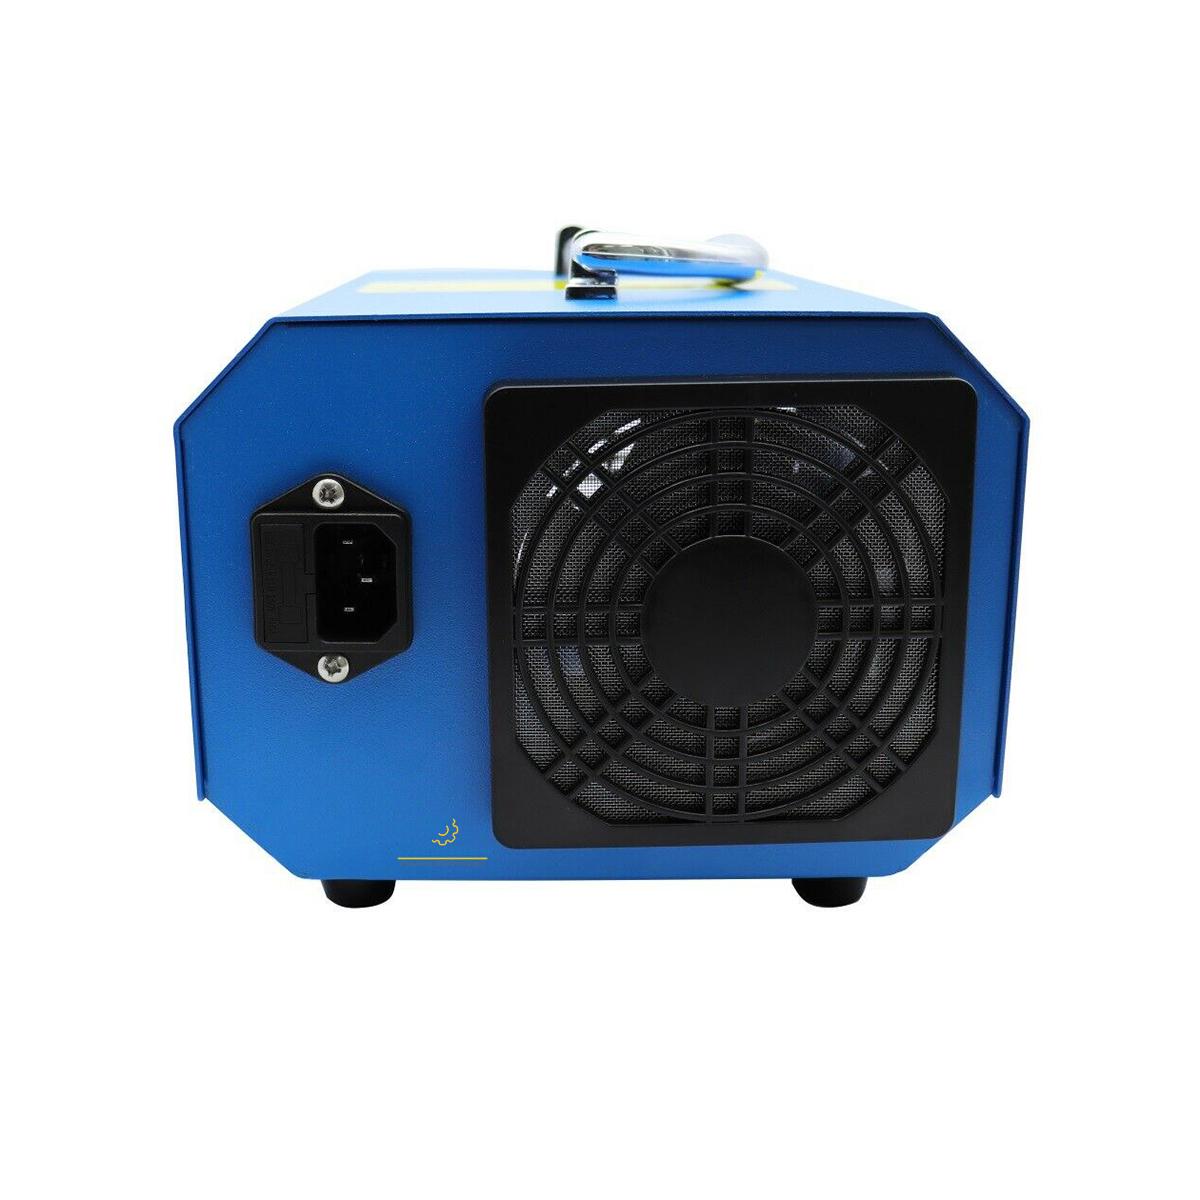 Ozónový generátor 7G Profi 1 - 300m³ BC-7000-141D